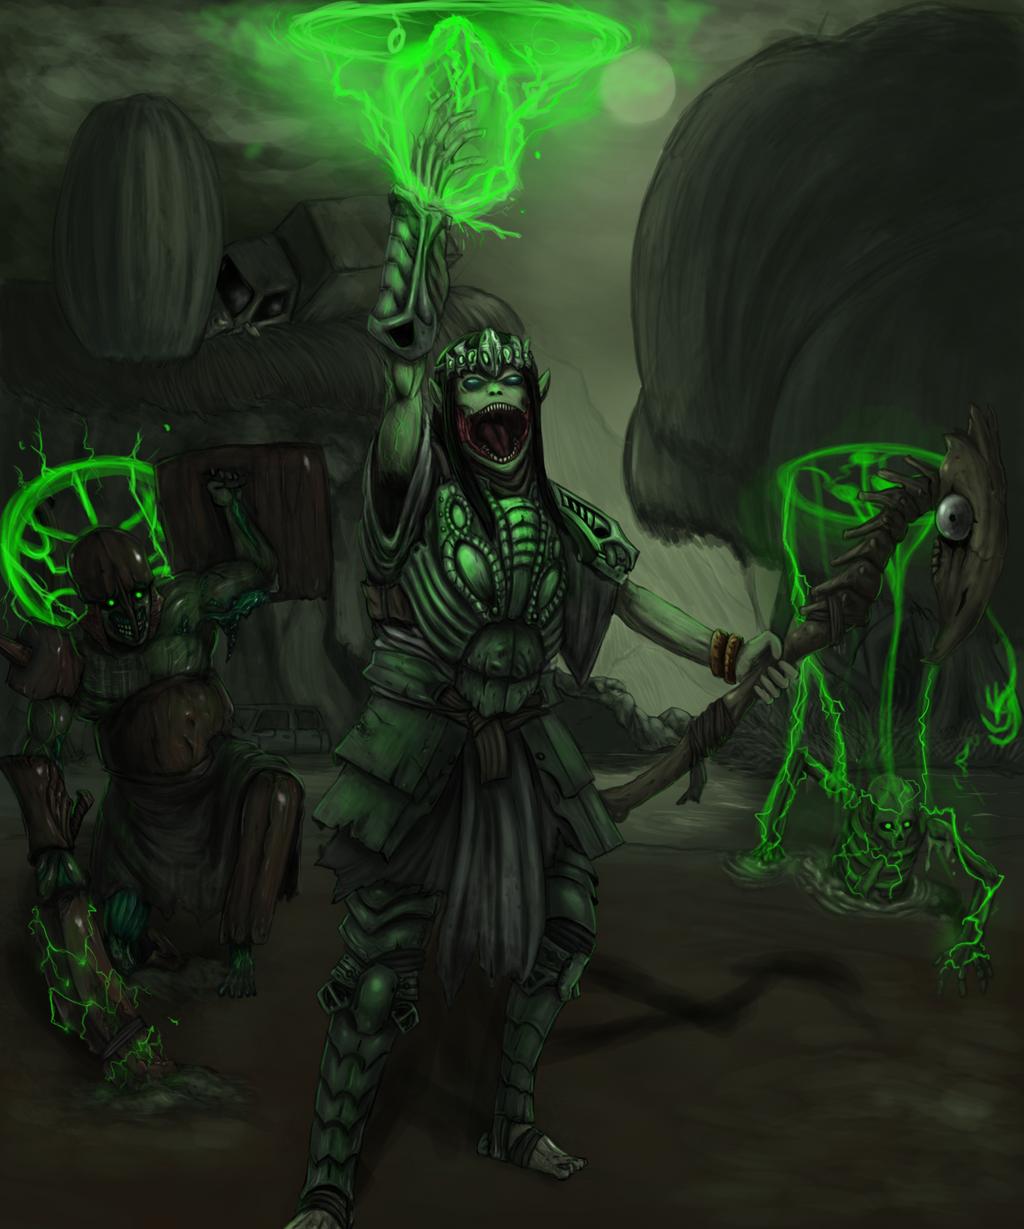 Necromancer by galtar66